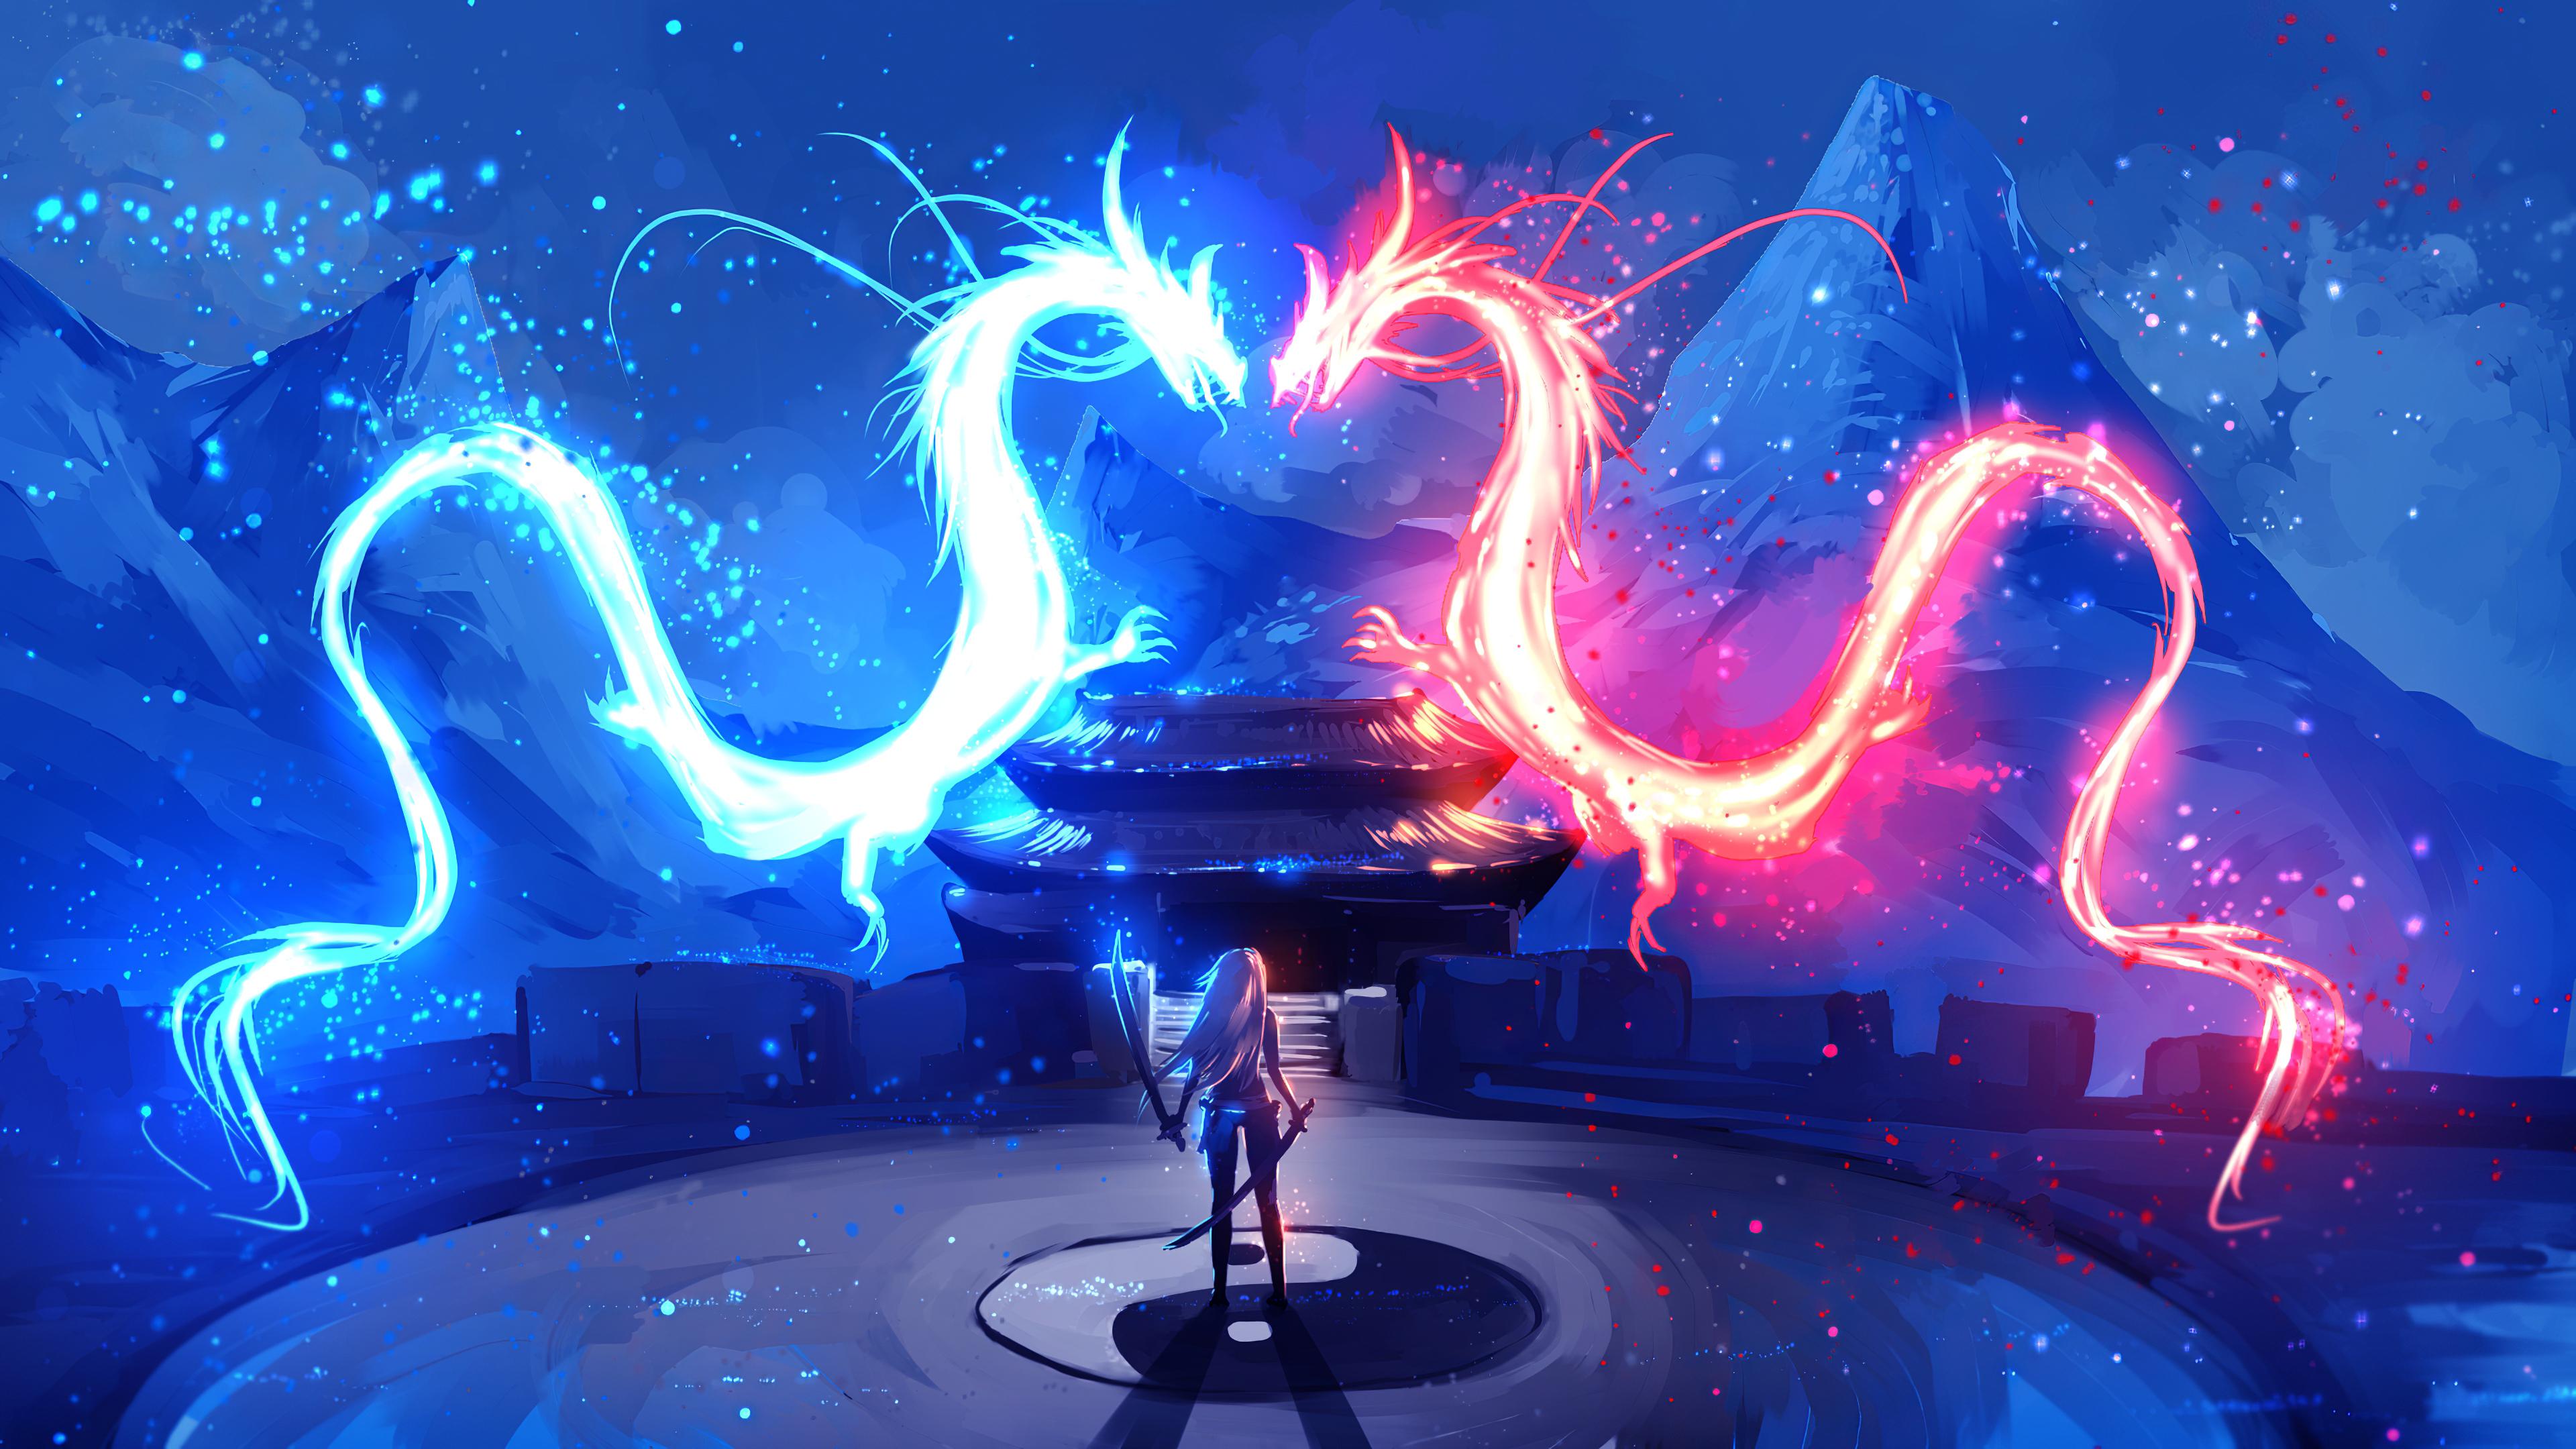 Wallpaper 4k Dragon Red Blue Colorful Art